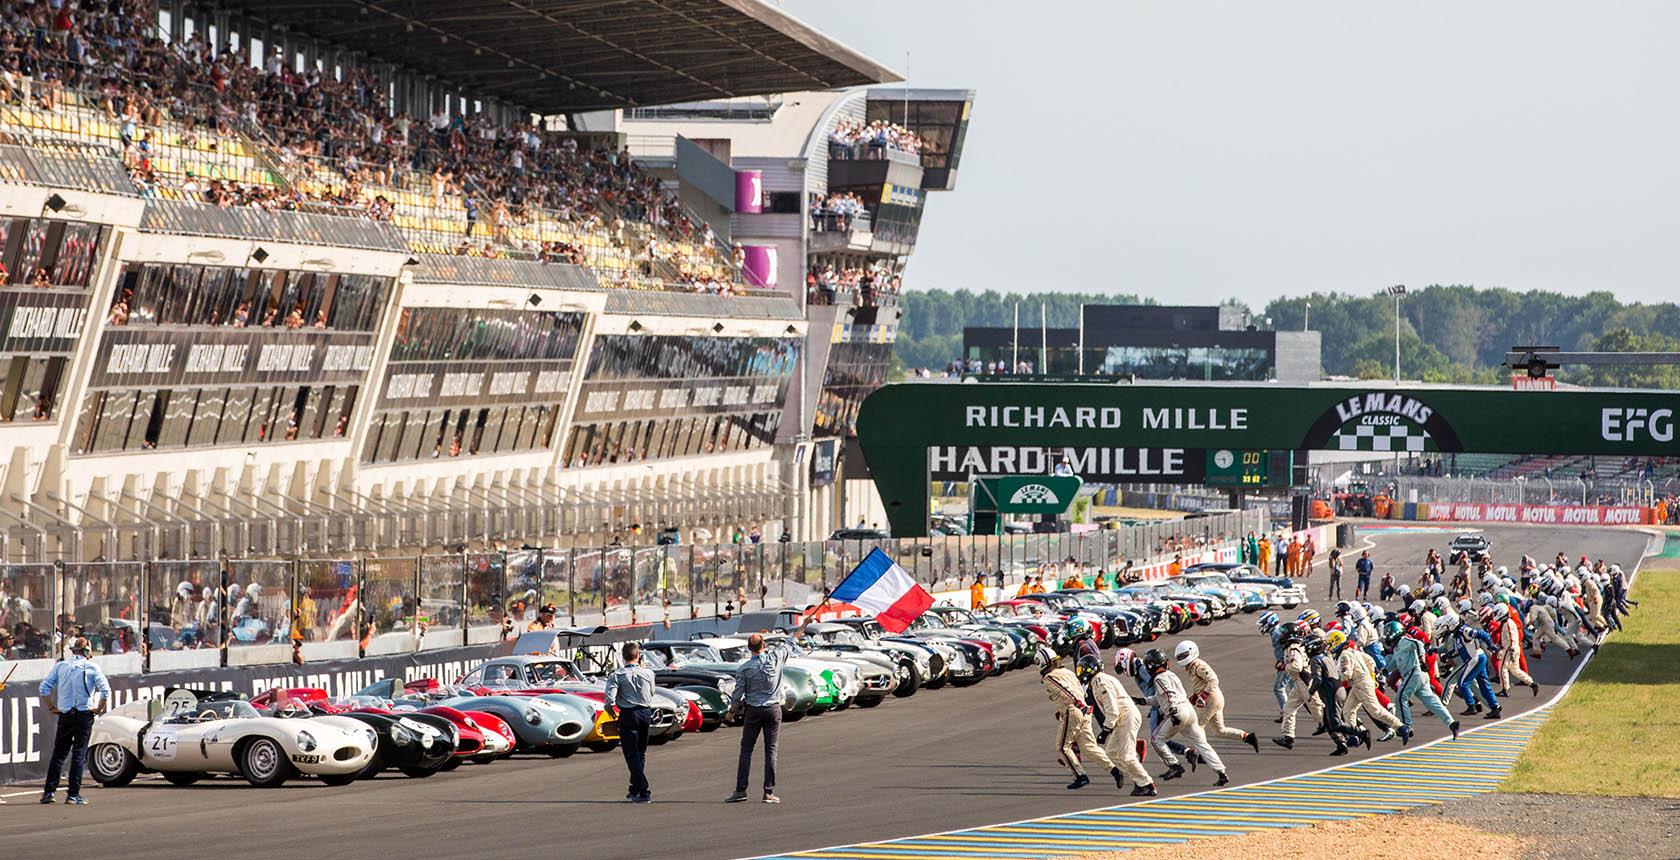 giải đua xe Le Mans Classic